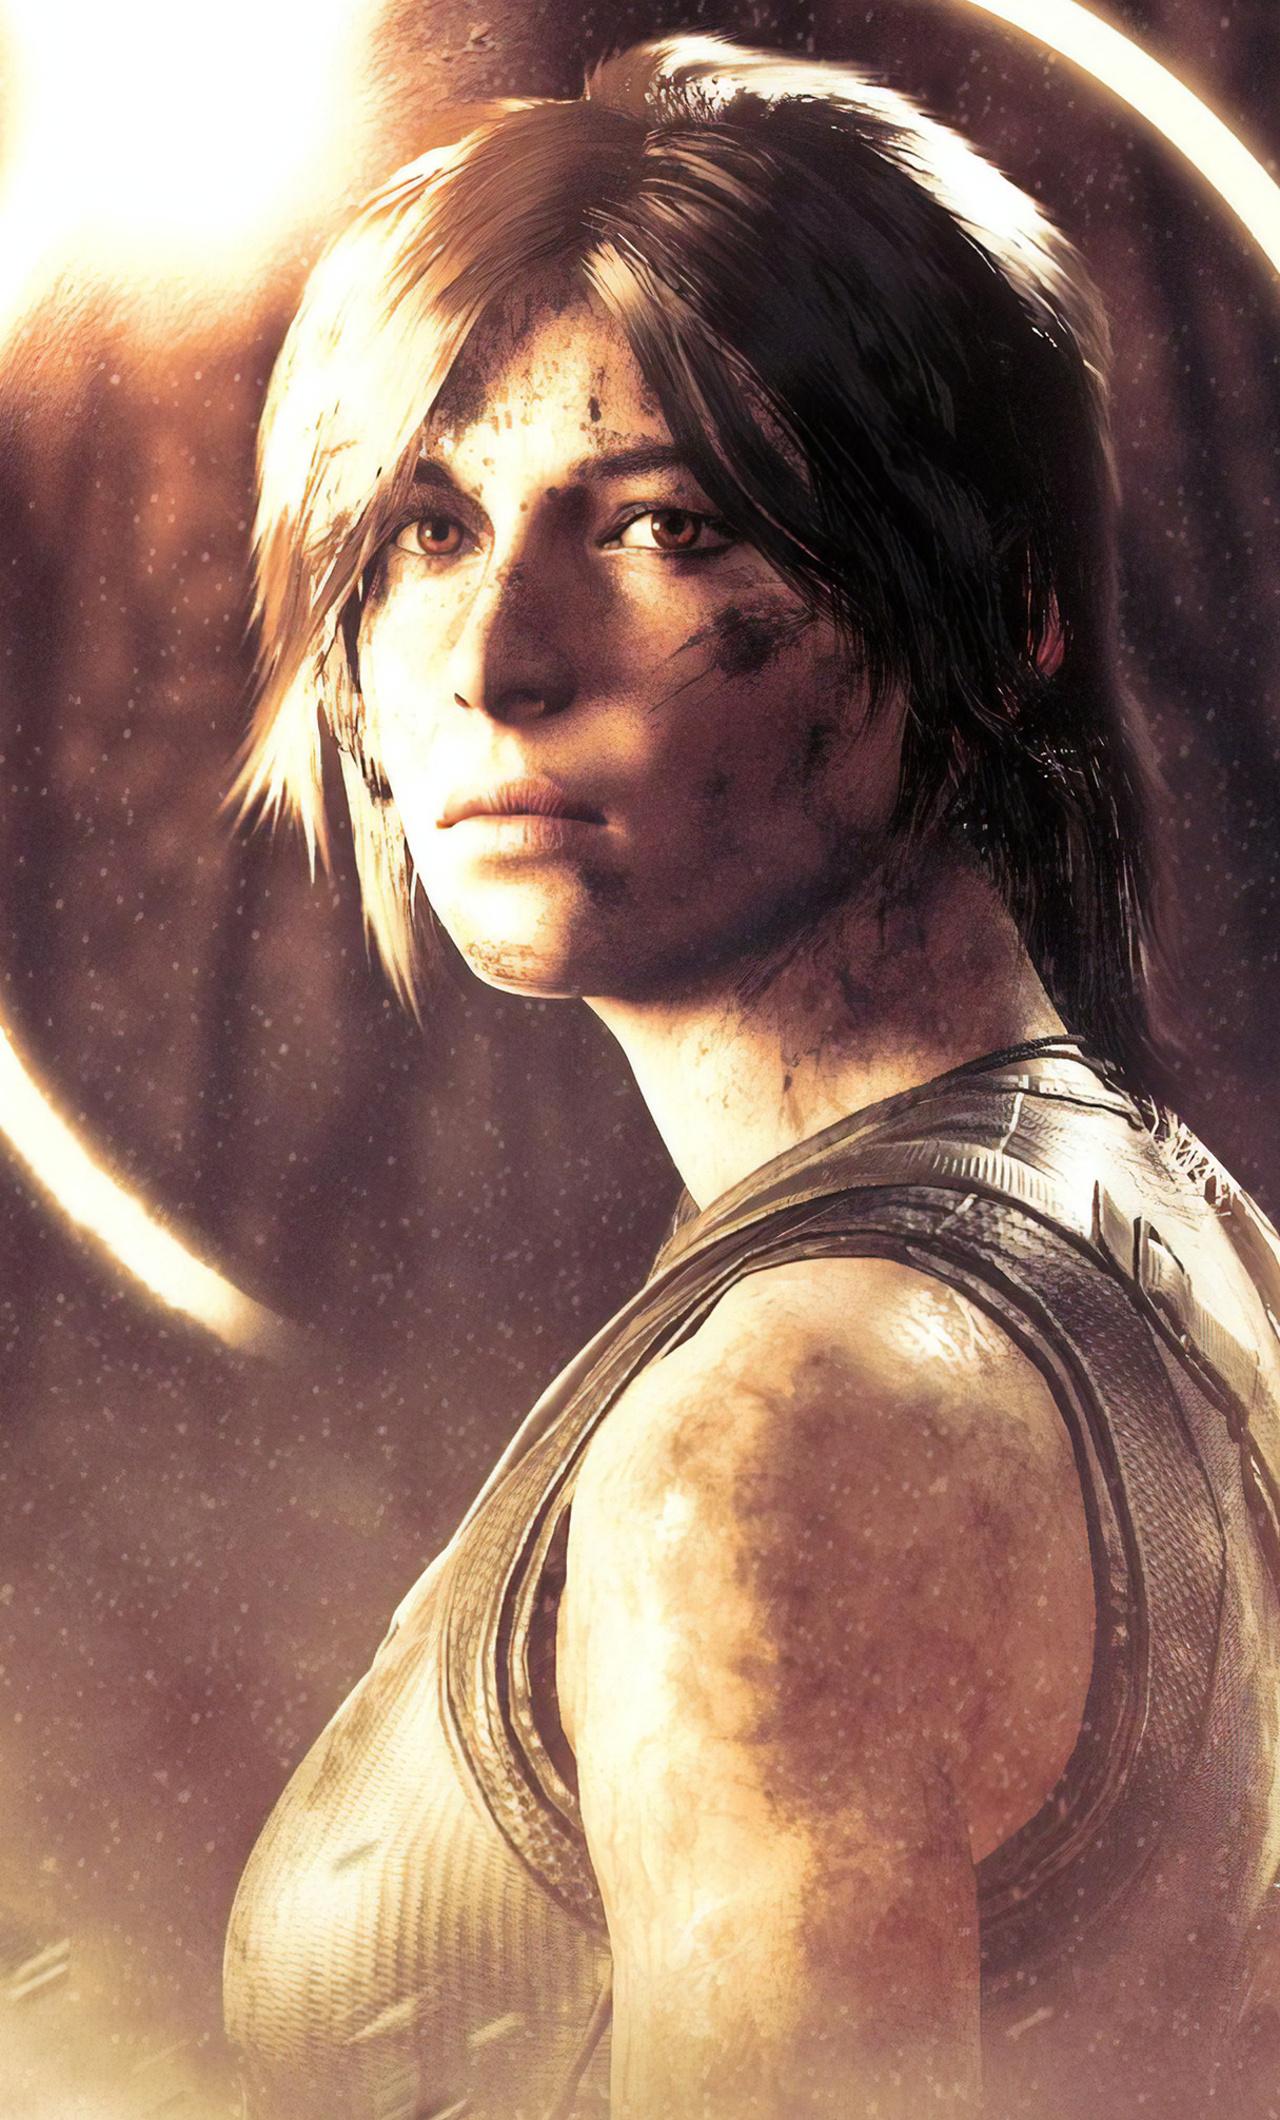 lara-croft-from-shadow-of-the-tomb-raider-pe.jpg